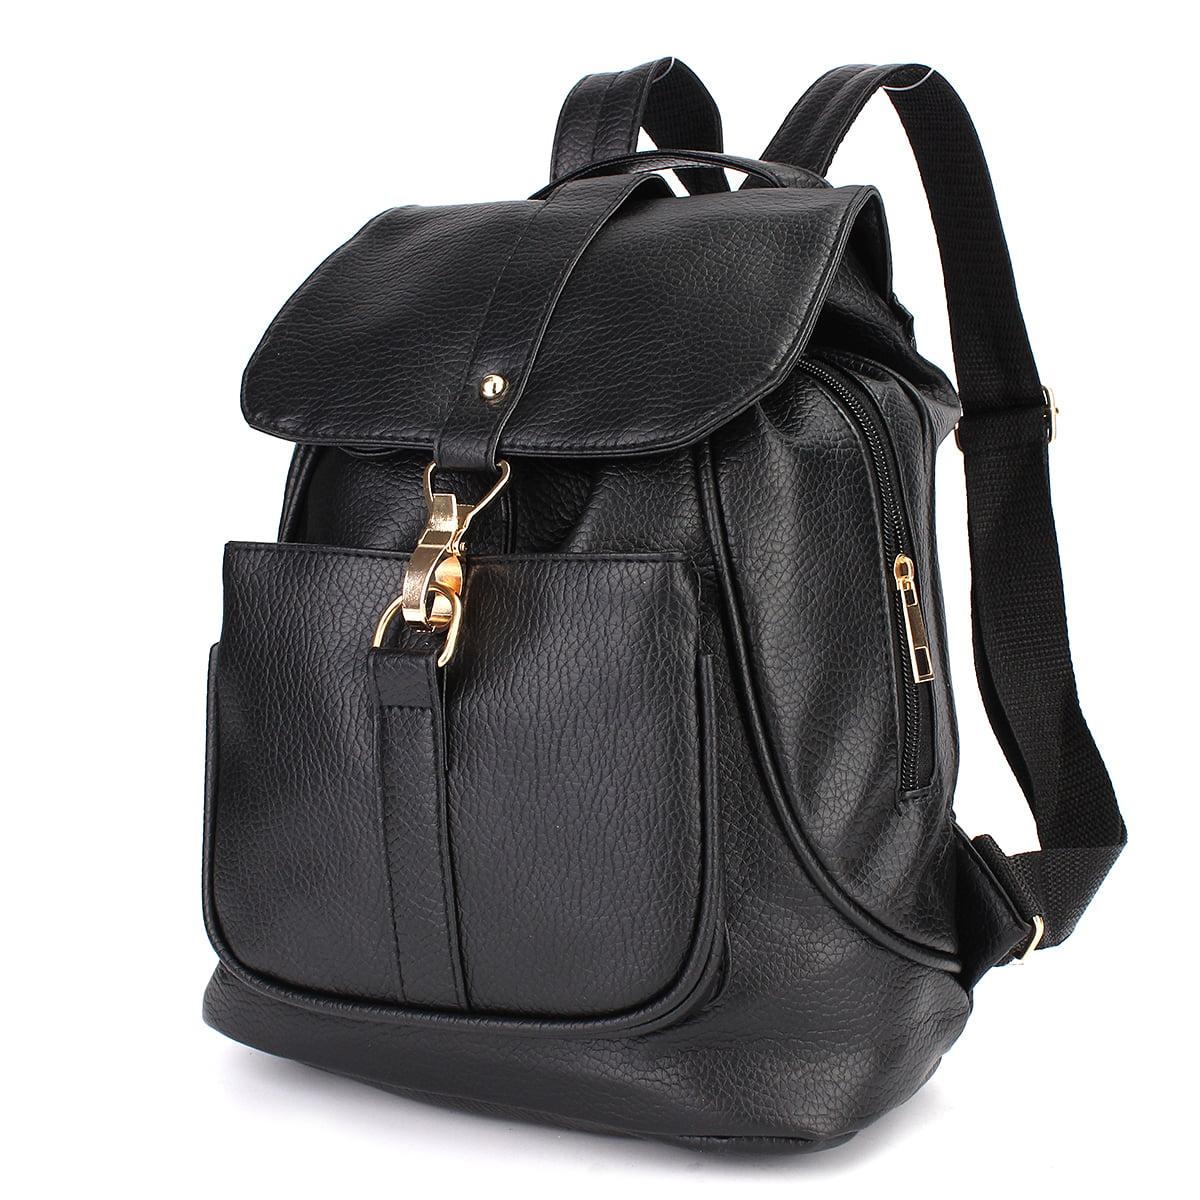 Fashion Women Ladies Backpack Travel Leather Rucksack Shoulder Bag School Bookbag Black by